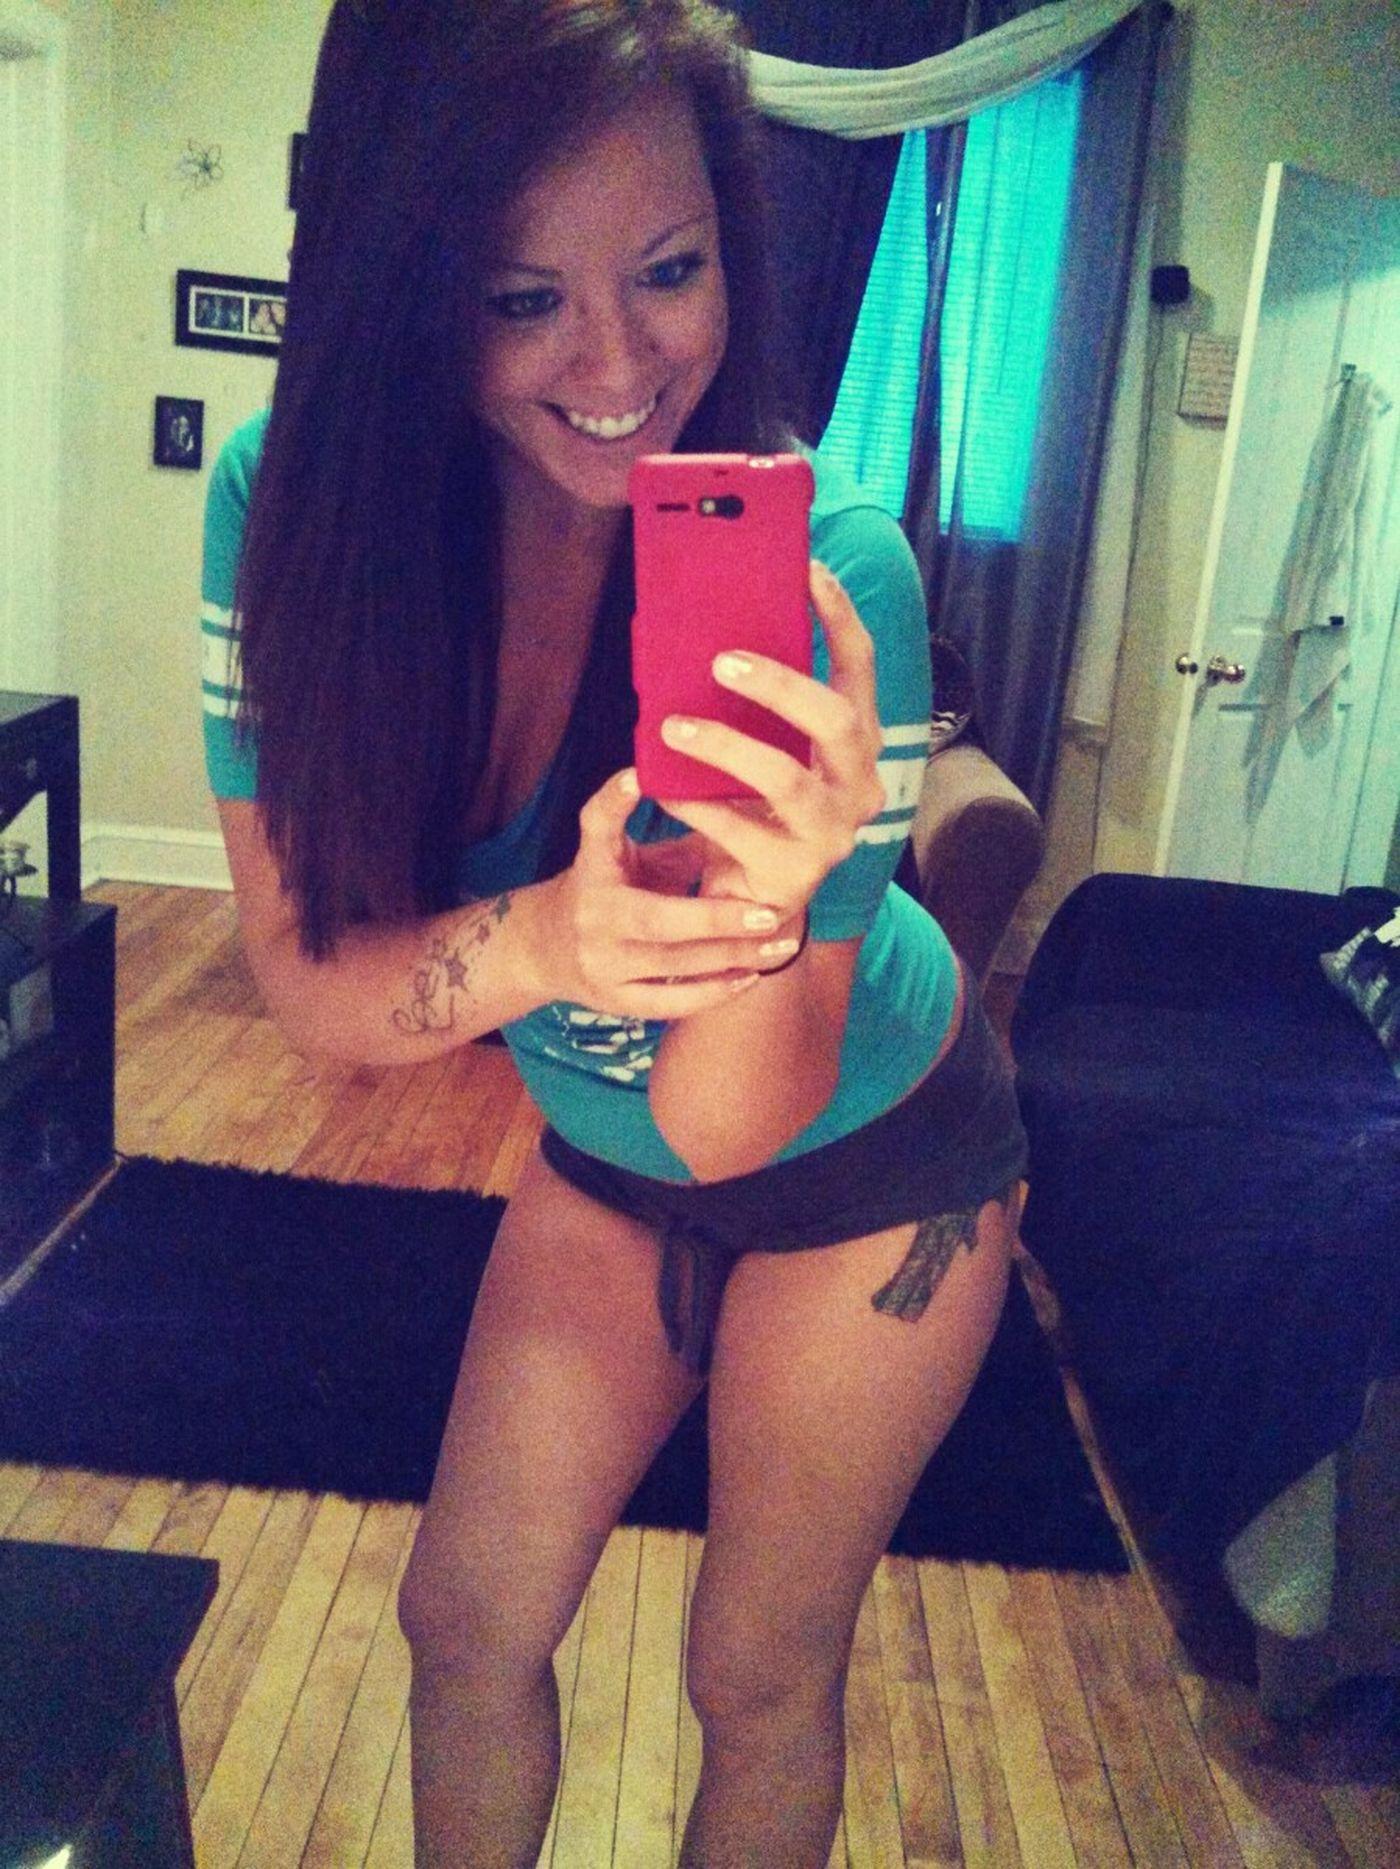 Pistol Loaded Selfie Girls With Tattoos Smoking Gun  Ready To Kill 